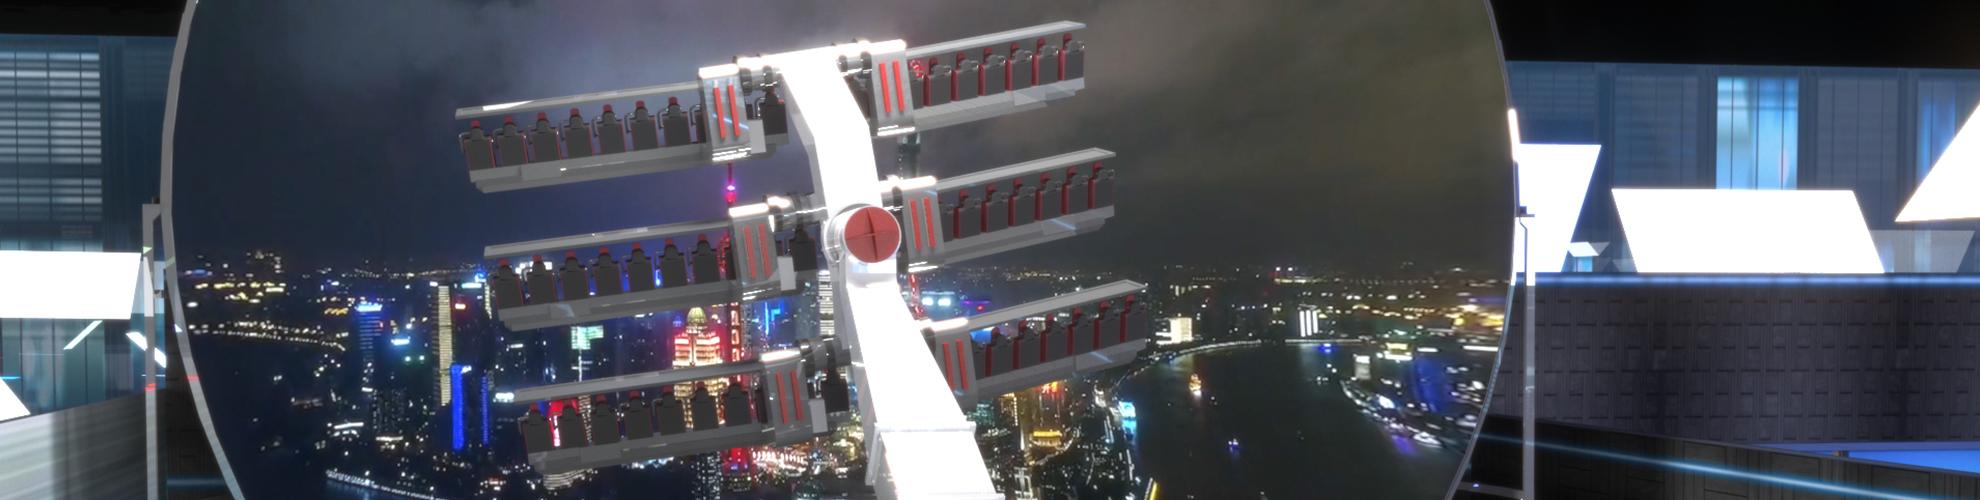 Simworx 360 Flying Theatre Dome Cinema Simworx